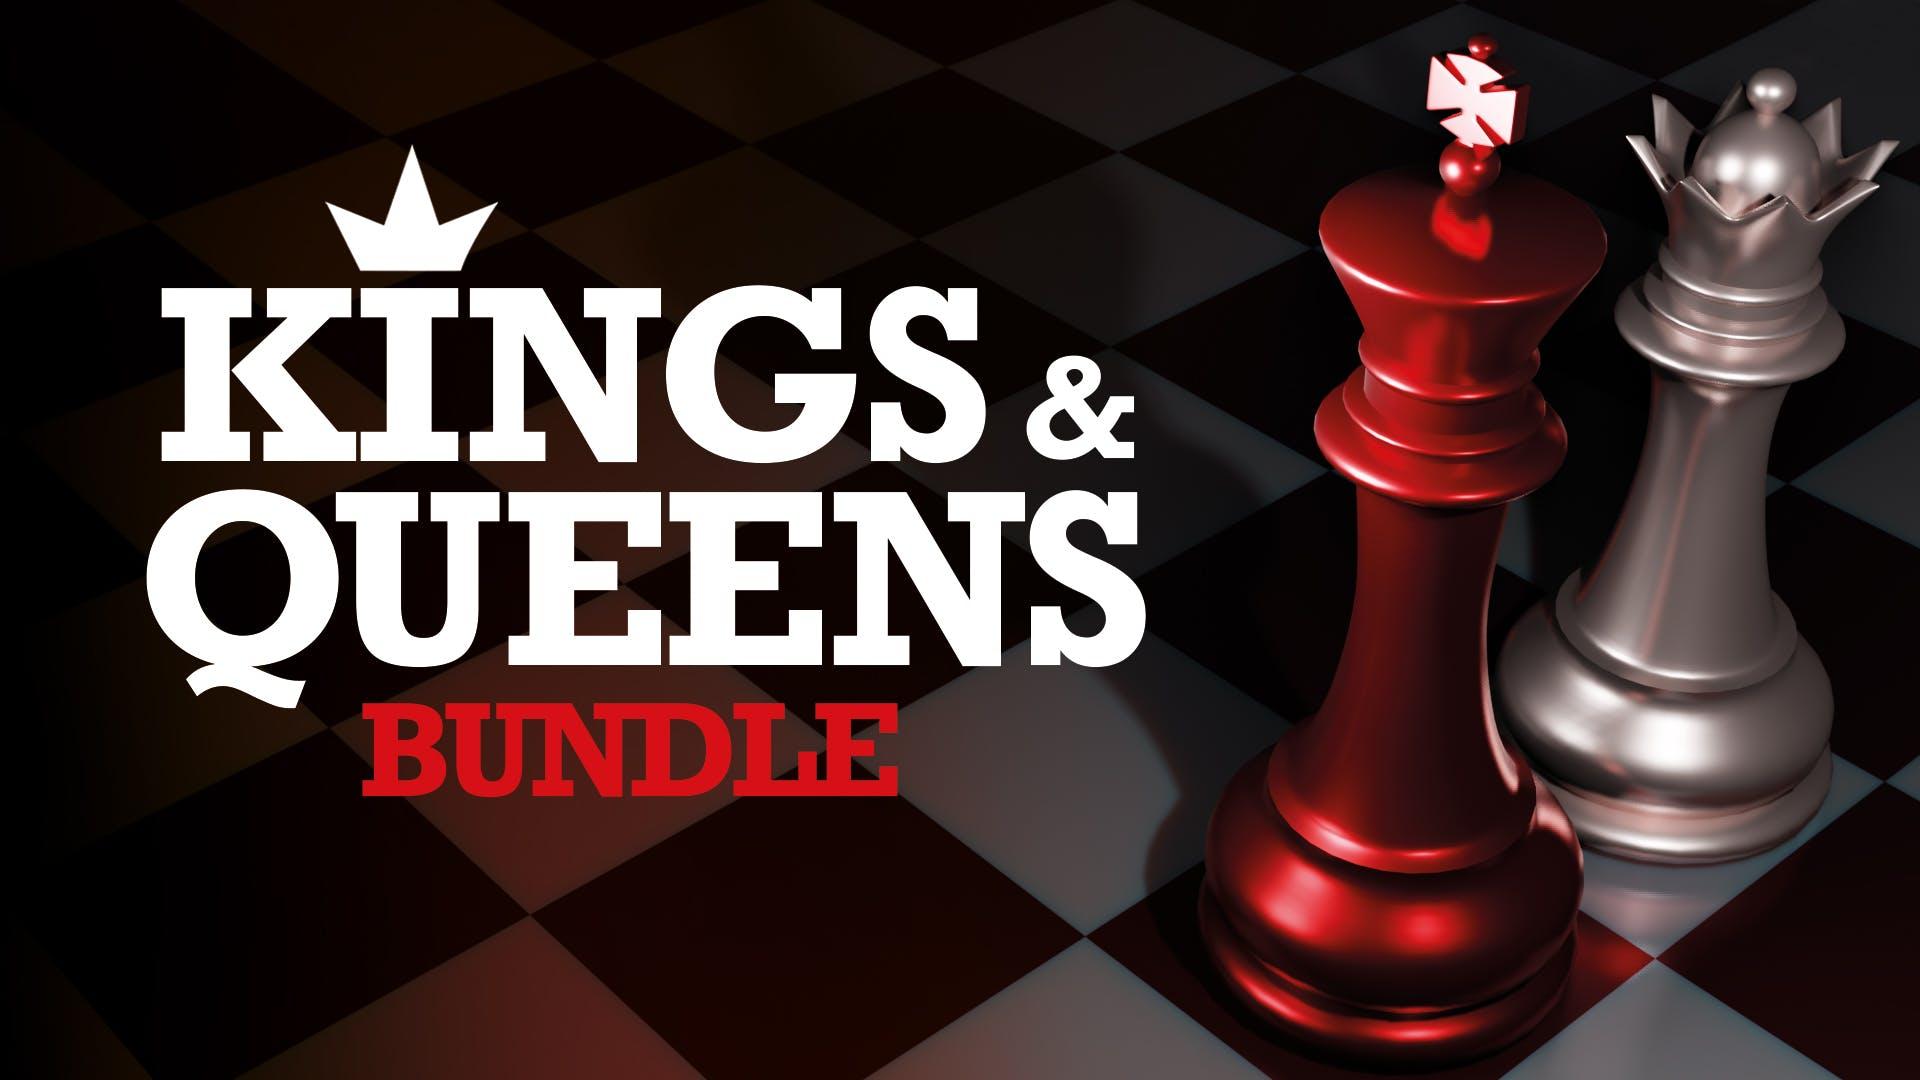 Kings & Queens Bundle